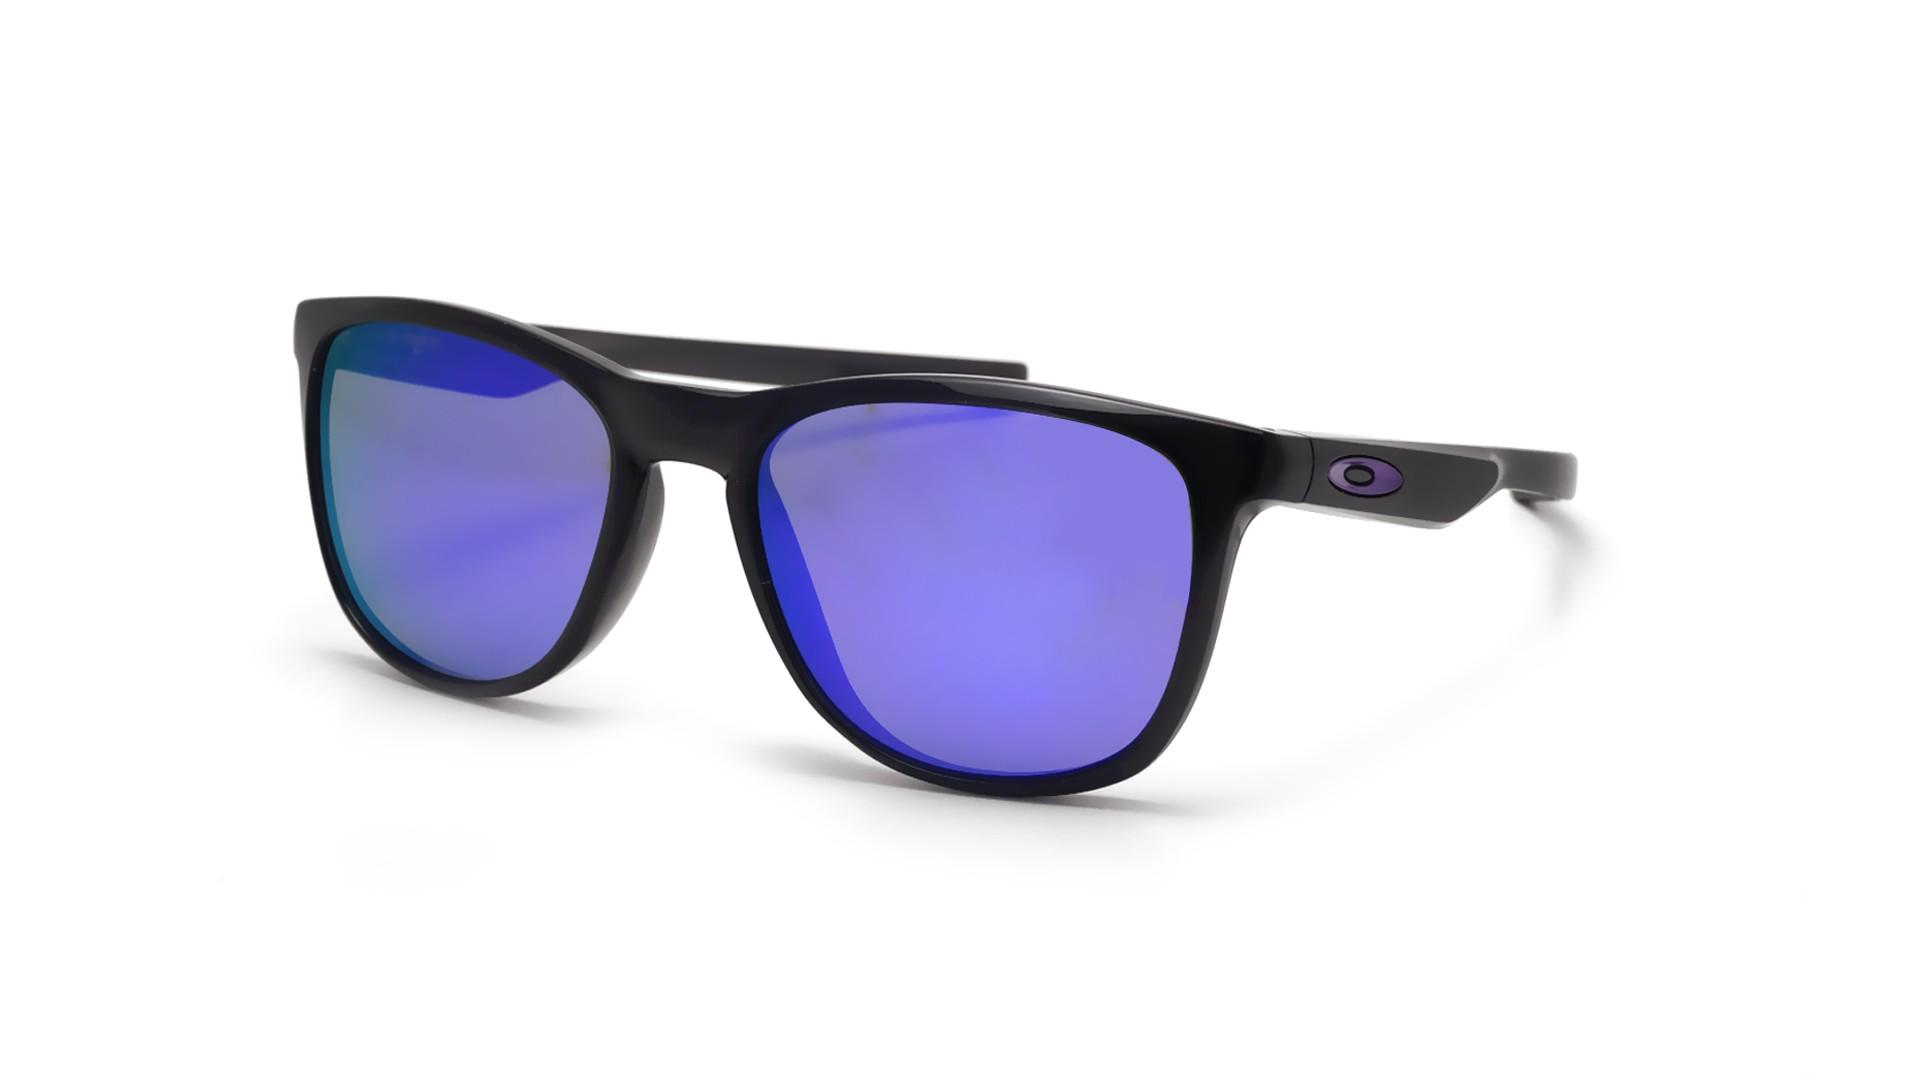 73796b4900 Sunglasses Oakley Trillbe X Black OO9340 03 52-18 Medium Polarized Flash